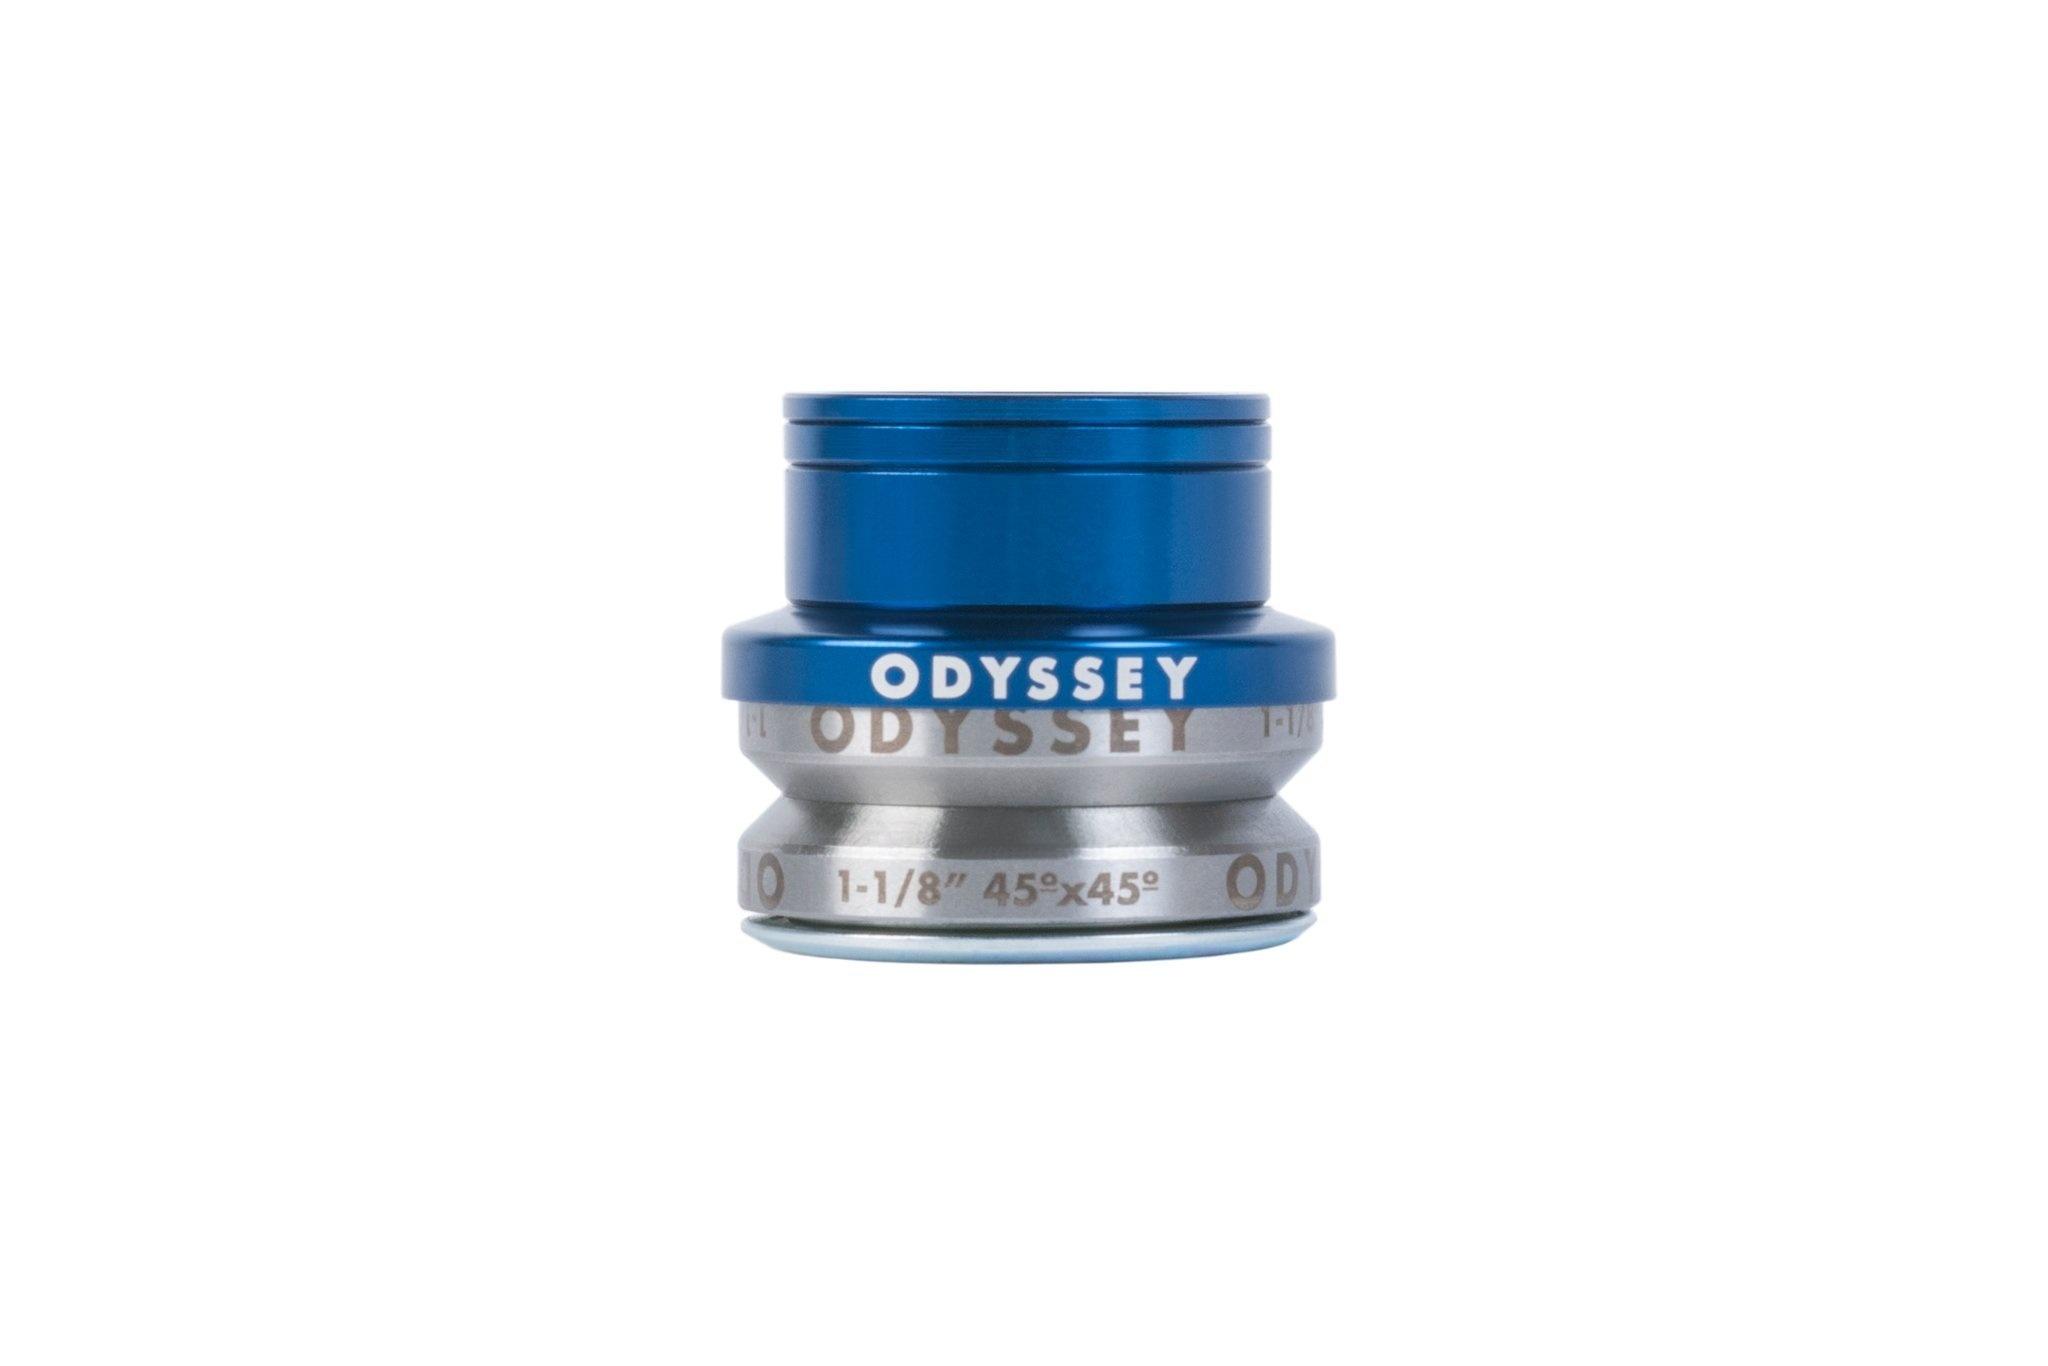 Odyssey Pro Headset